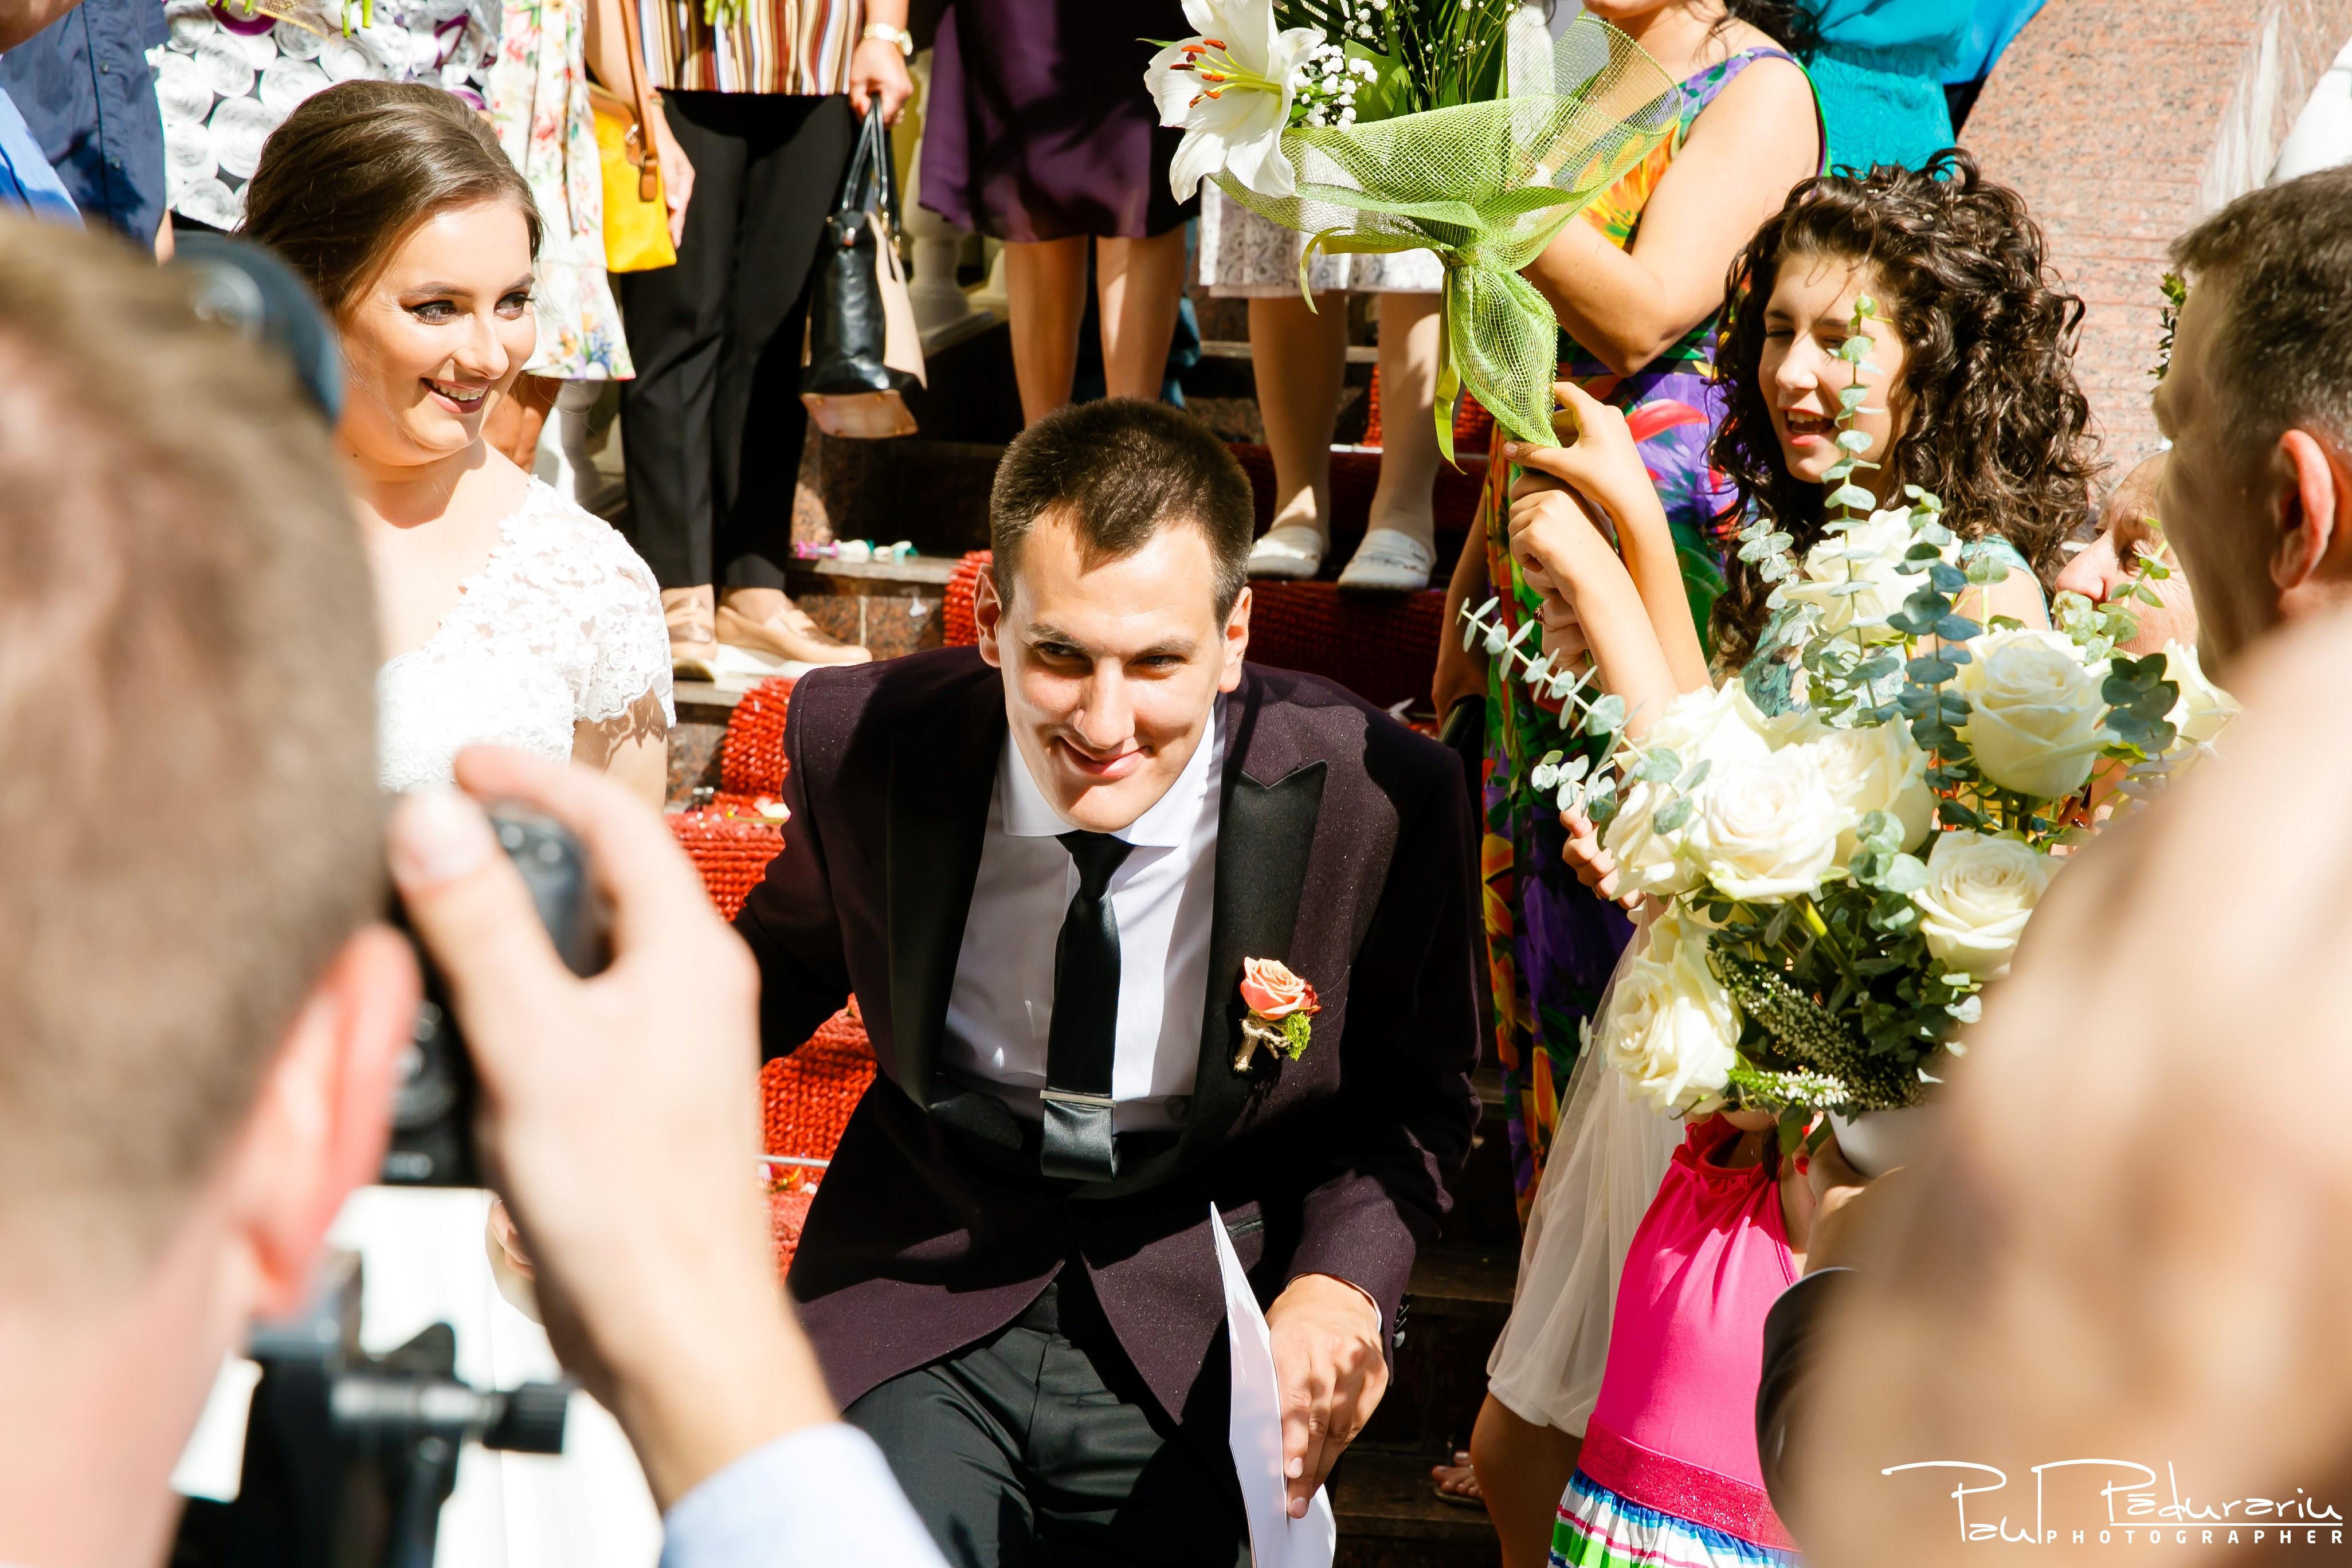 Cristina si Razvan nunta rustica la Bellaria Iasi cununia civila podul de flori miri fotograf profesionist nunta www.paulpadurariu.ro © 2017 Paul Padurariu